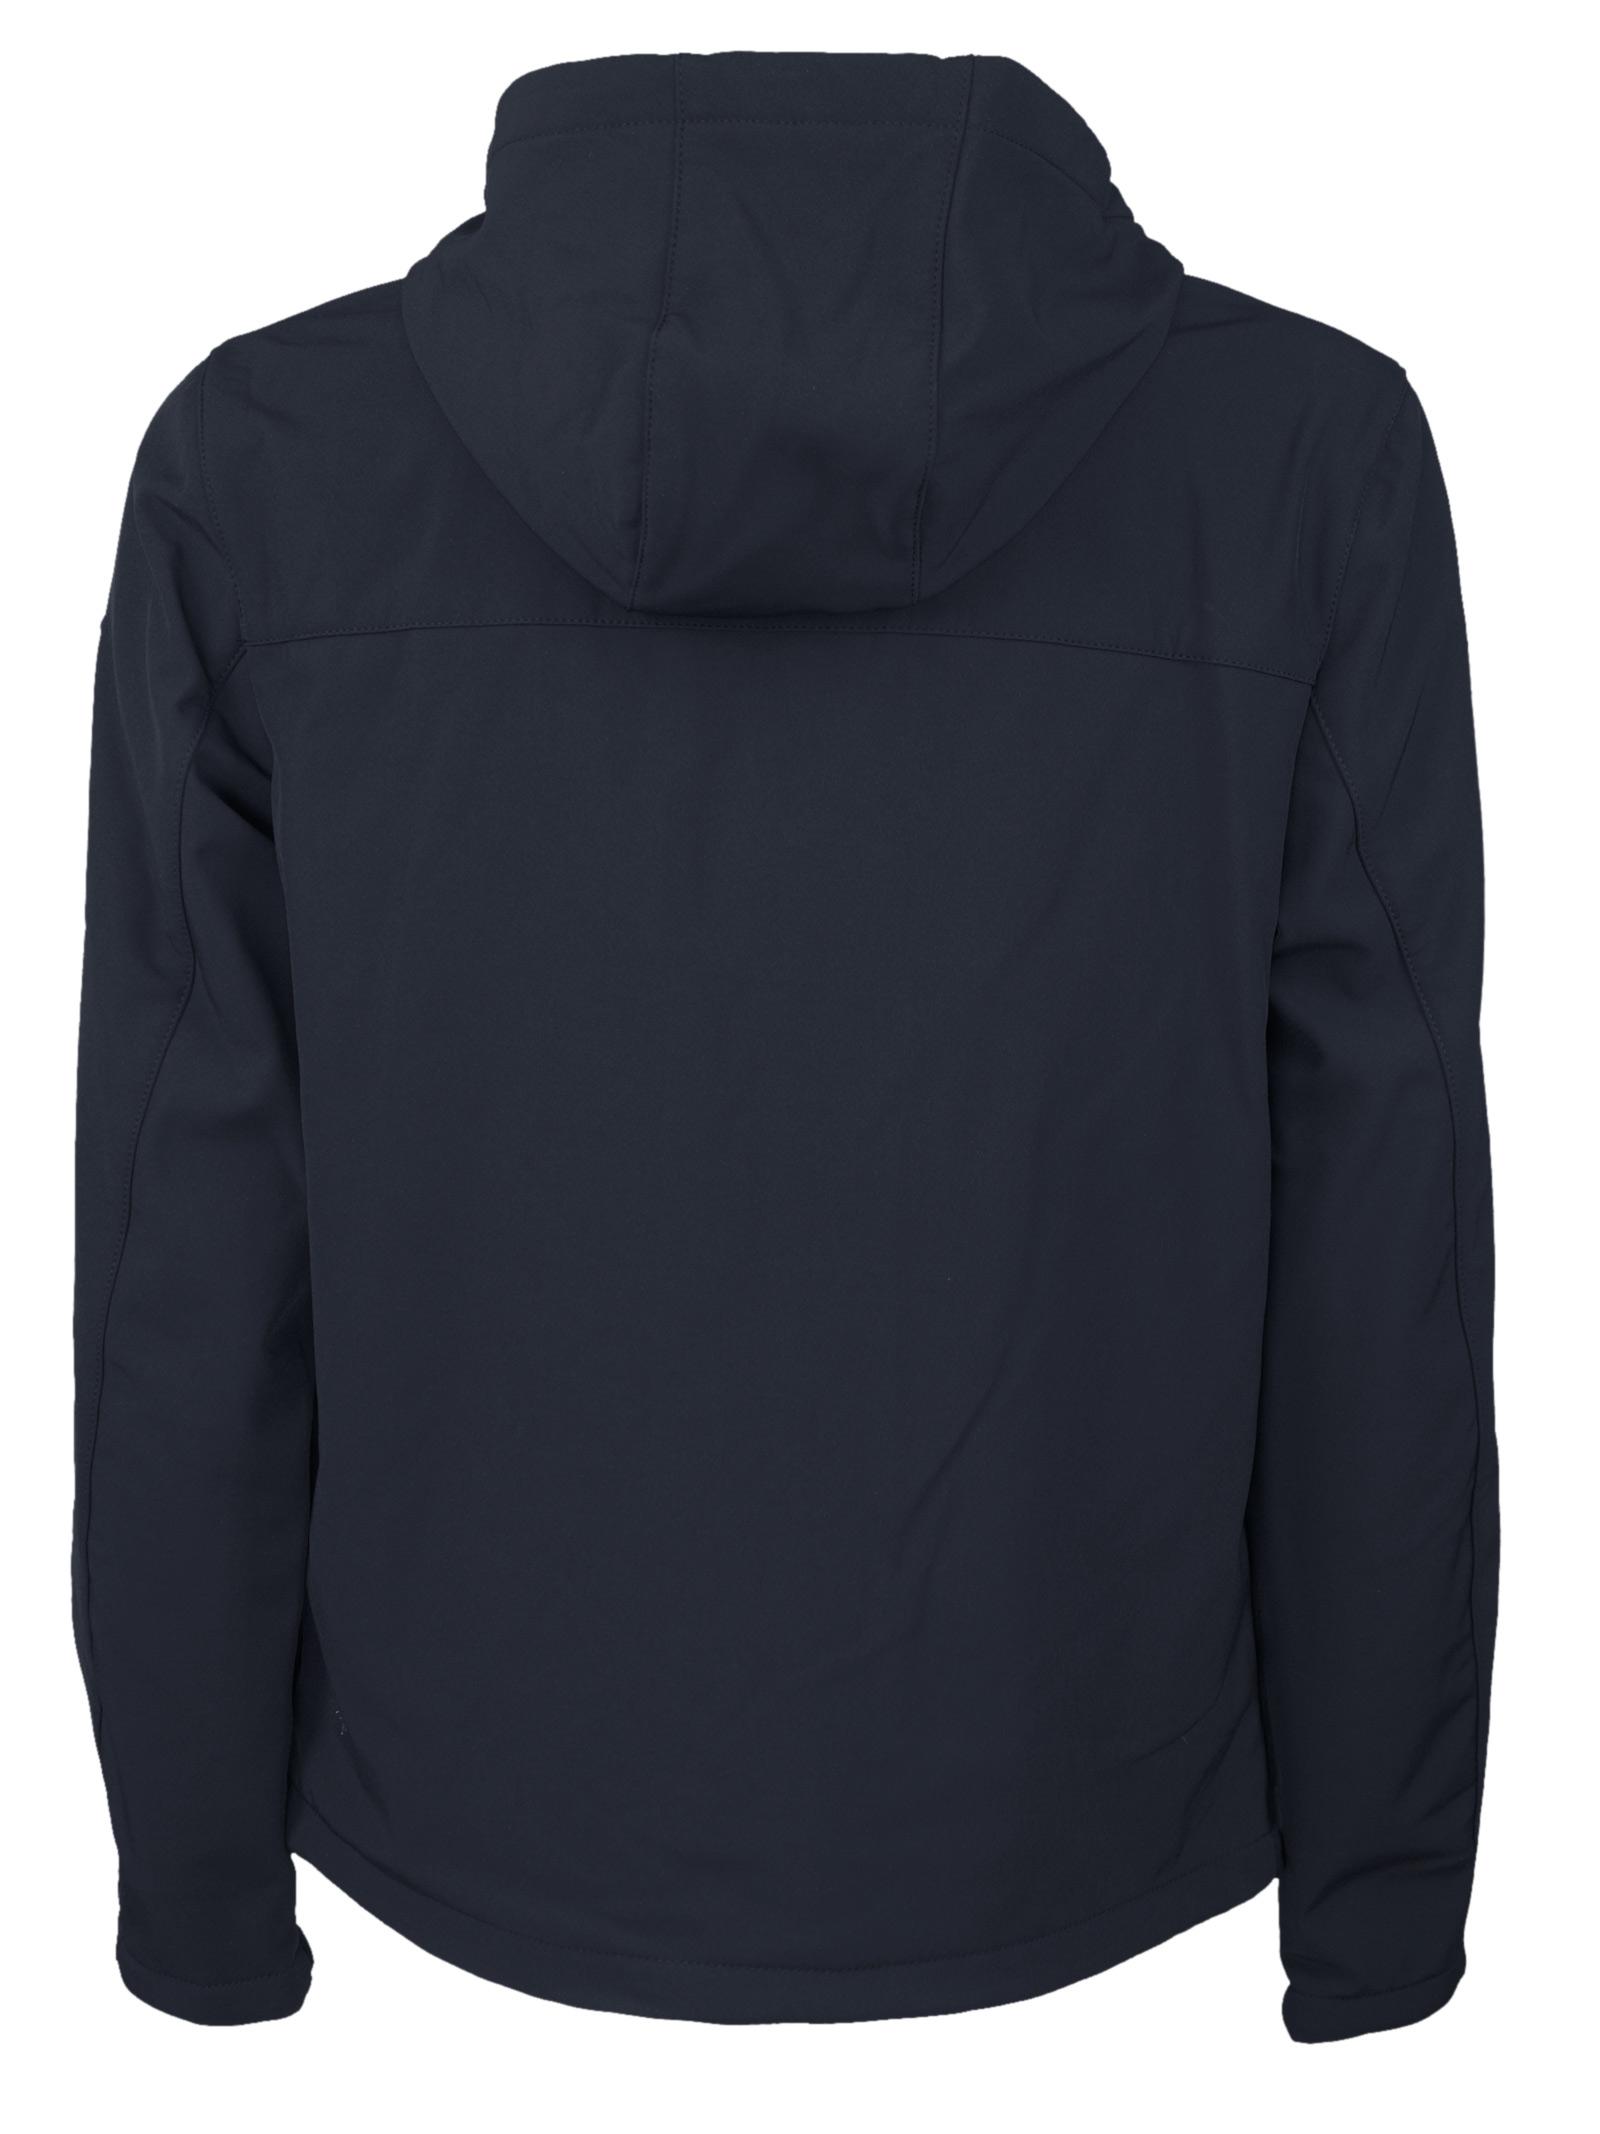 Hooded jacket CIESSE   Jackets   203CPMJ31321 99D23X396XXW